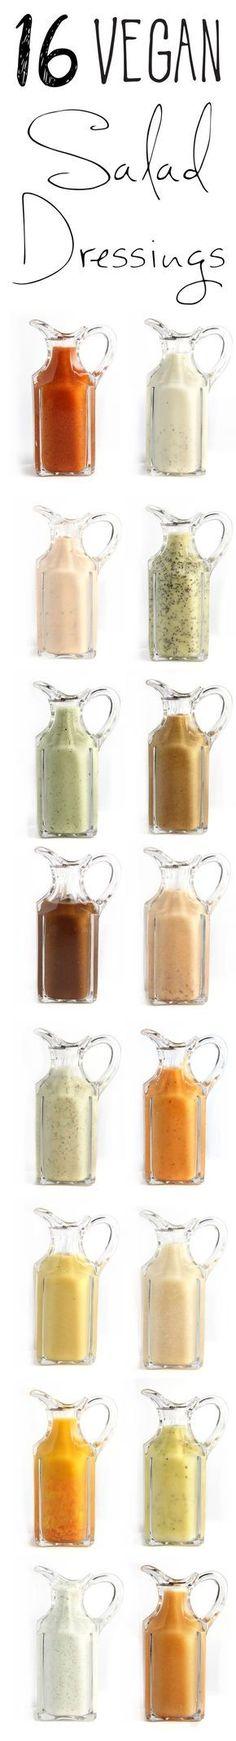 16 vegan salad dressing.